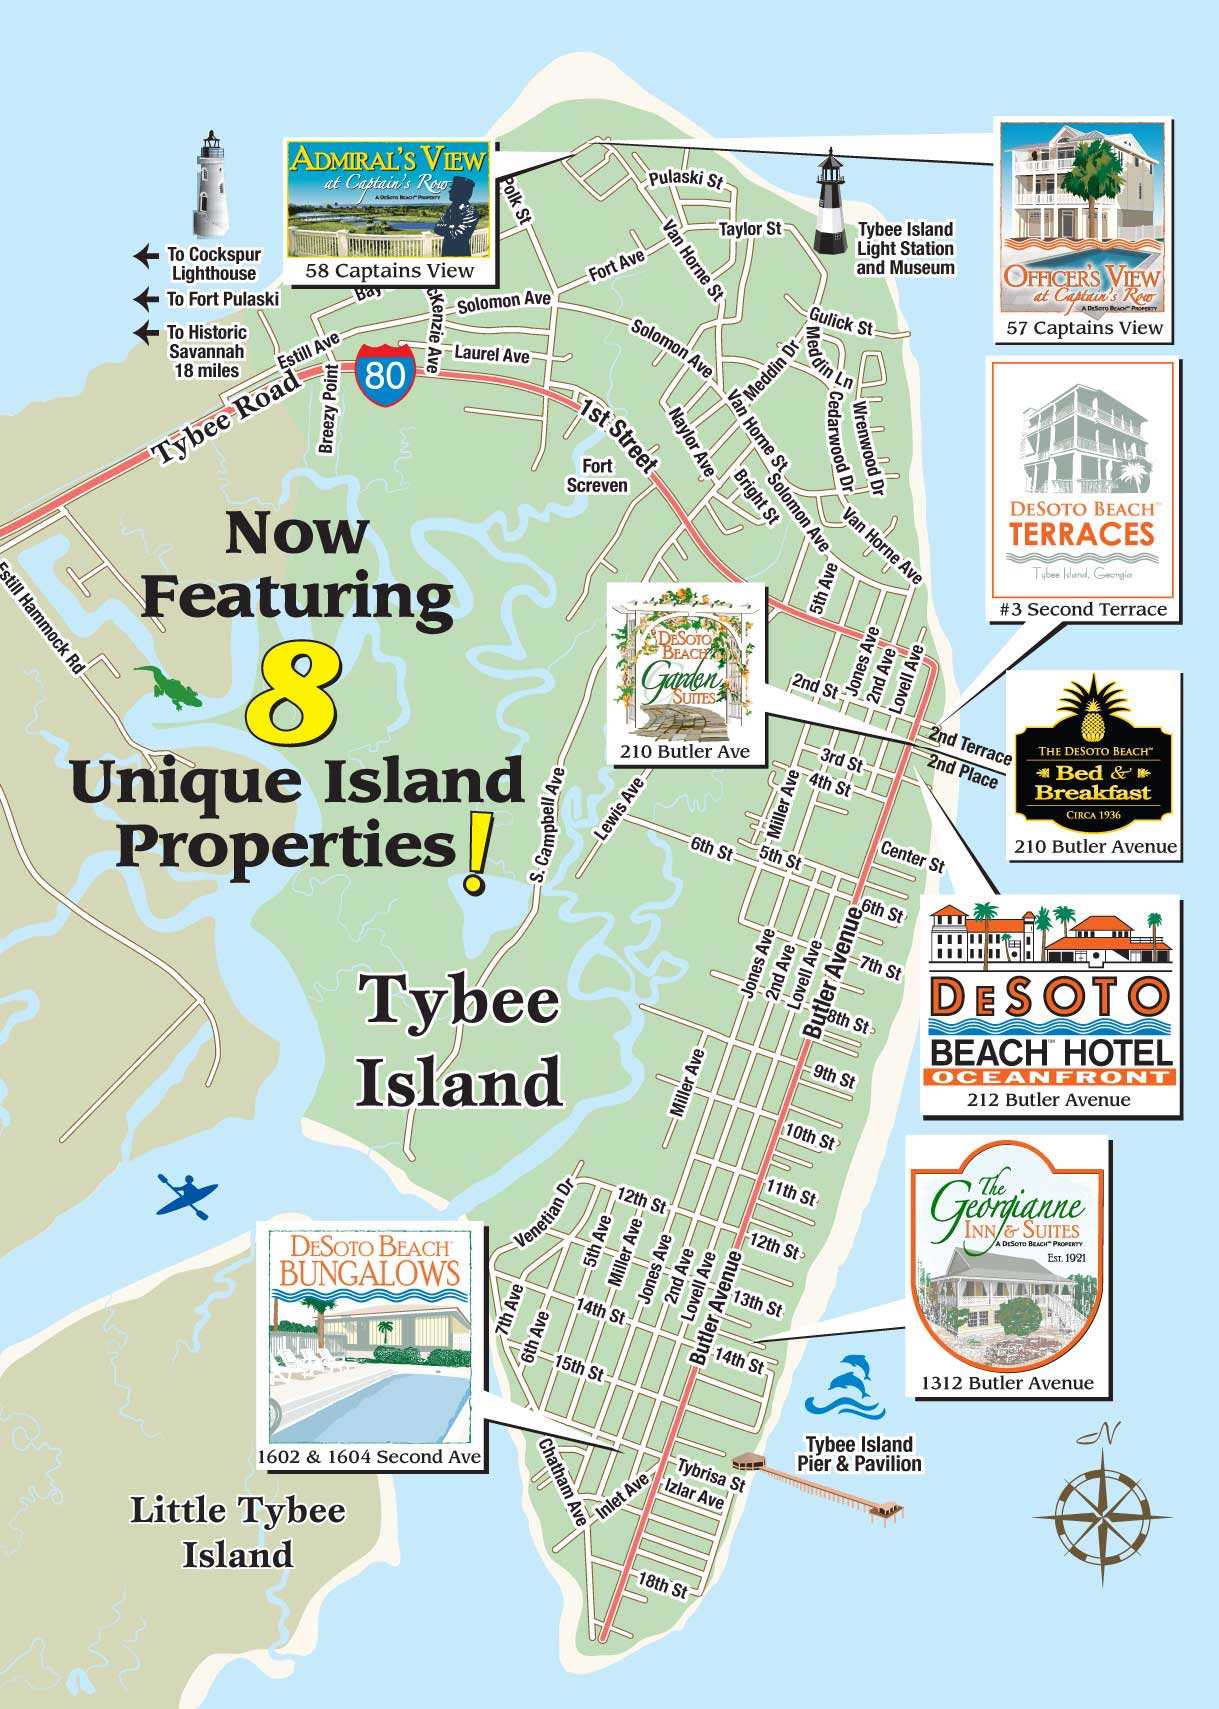 About us - DeSoto Beach Hotel